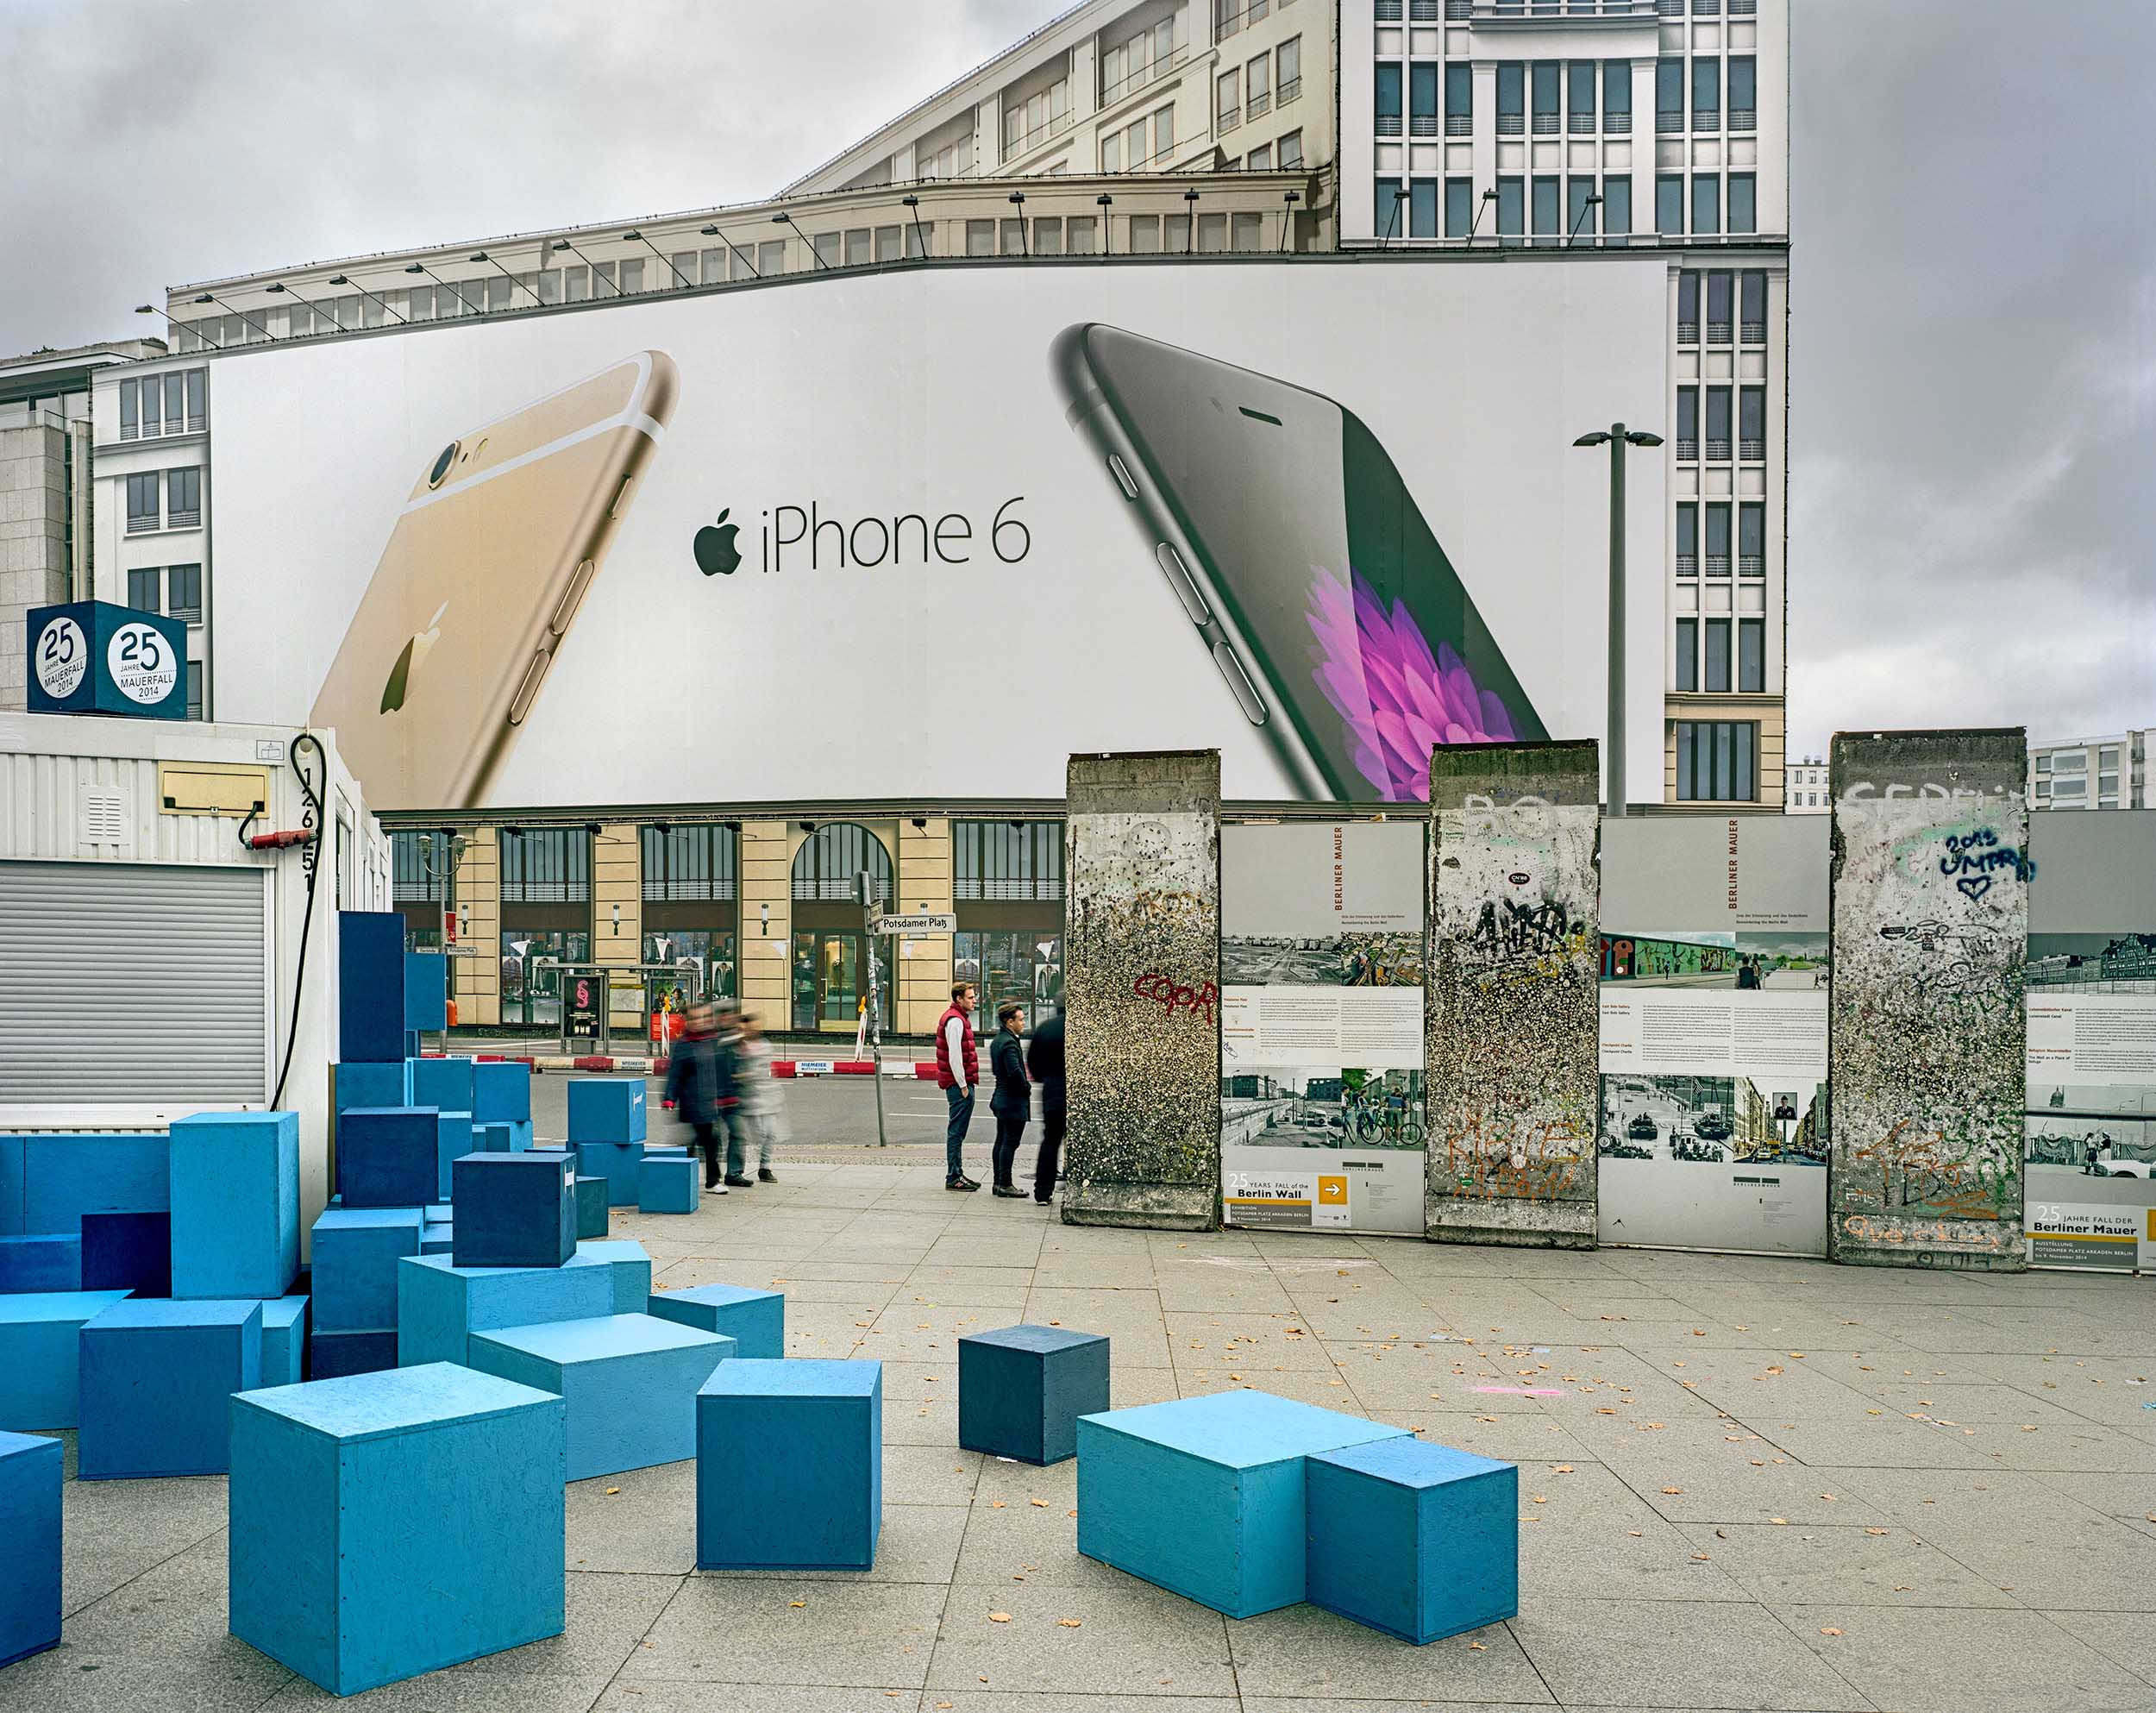 Berlin Wall Remant - 2014, © Brian Rose